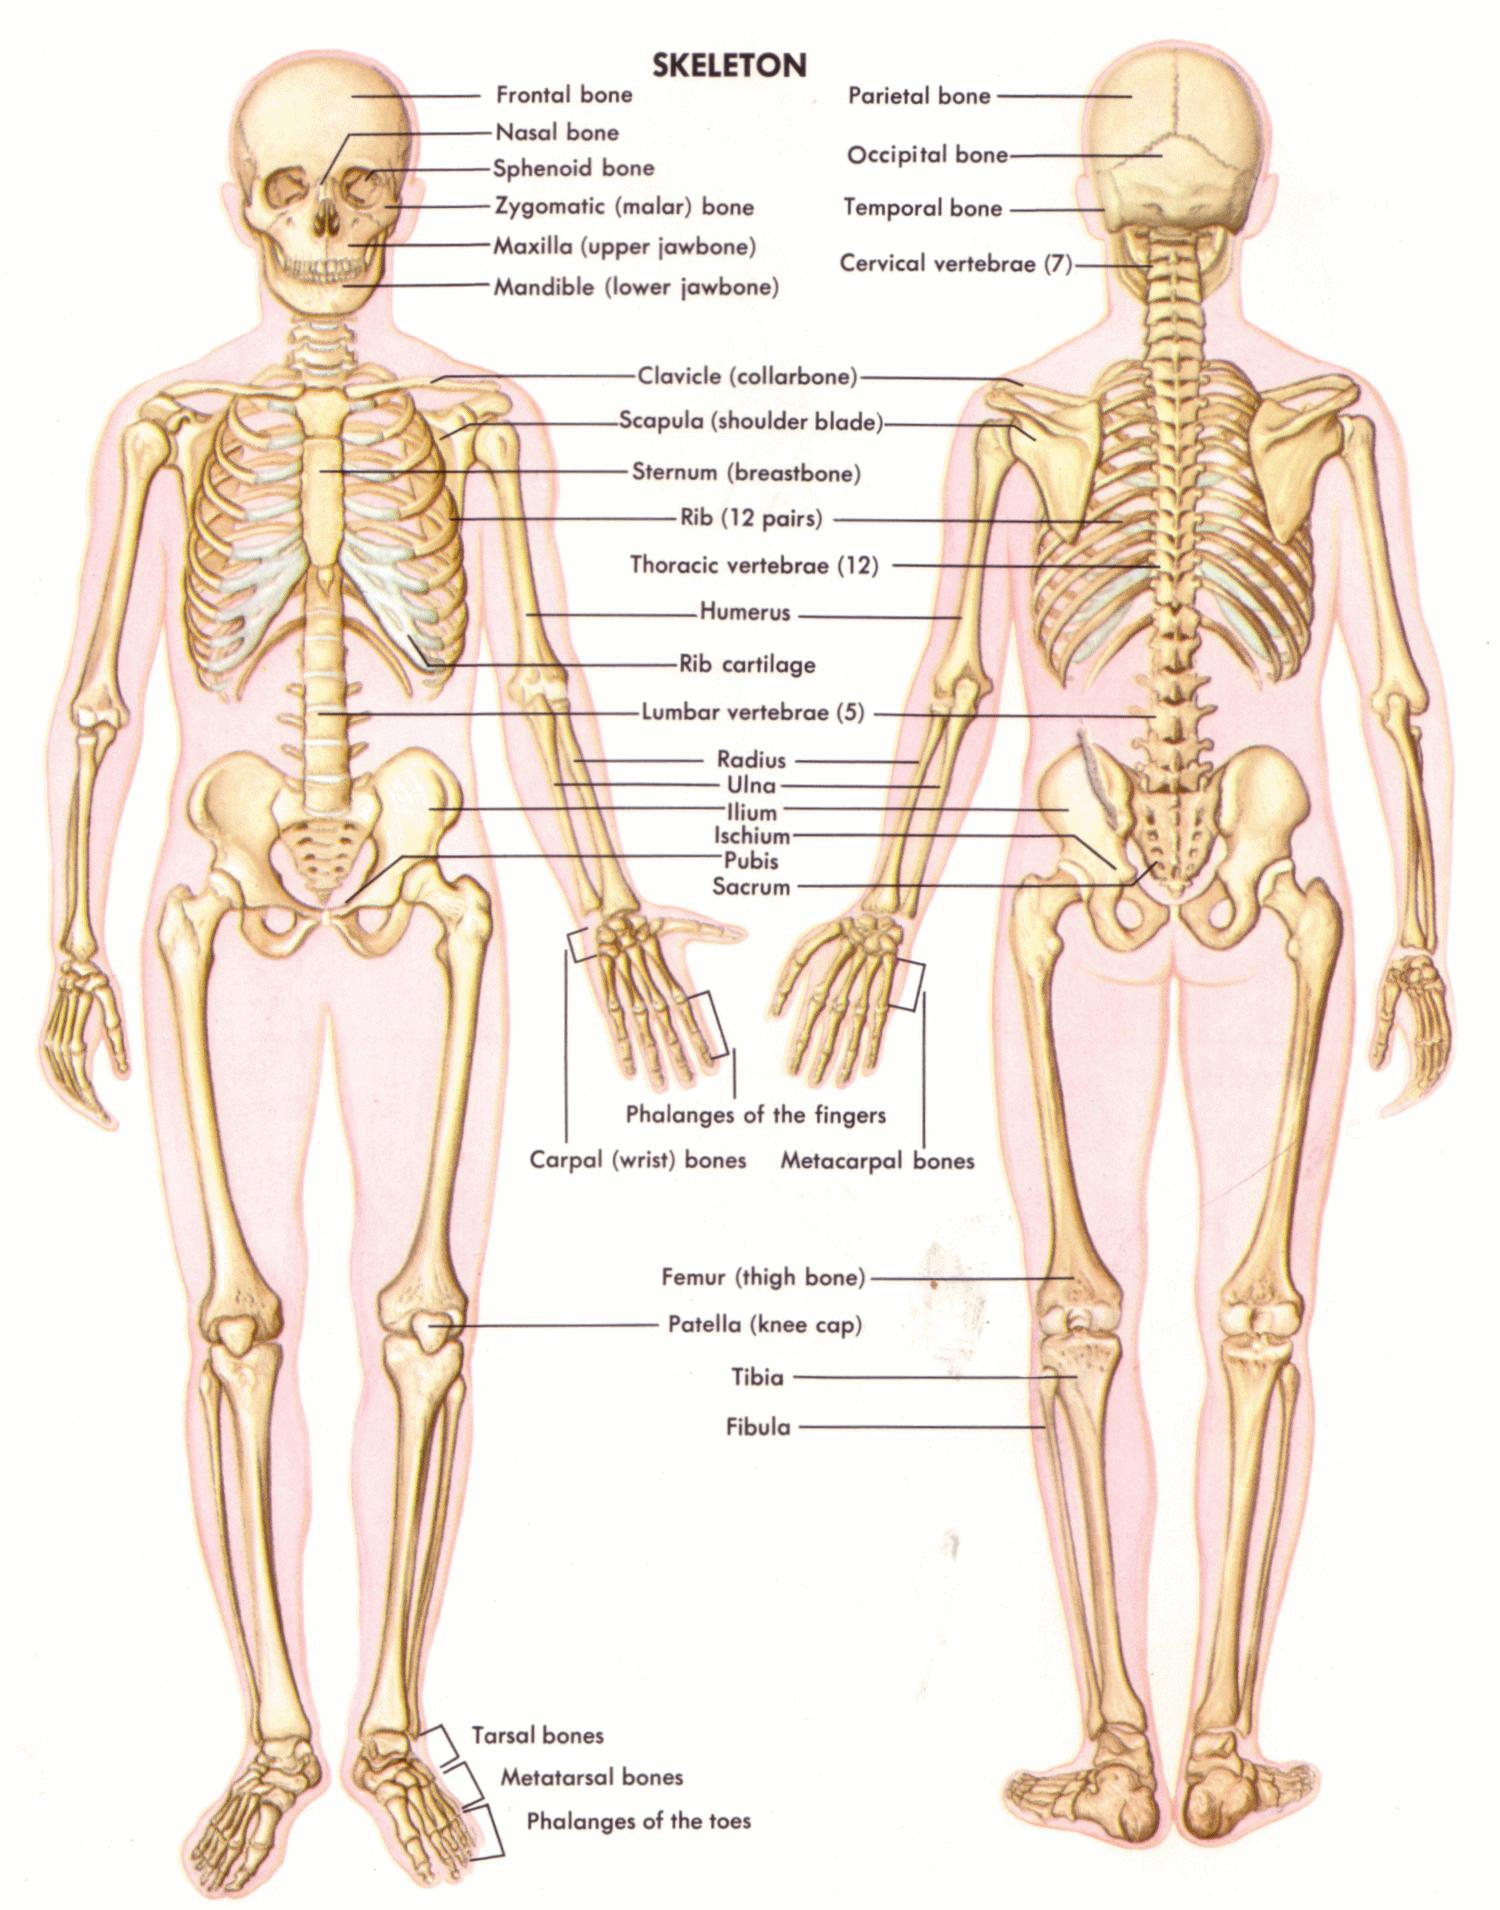 muscles of the body diagram endoszkopcom endoszkopcom wiring muscles of the body diagram endoszkopcom endoszkopcom [ 1500 x 1910 Pixel ]